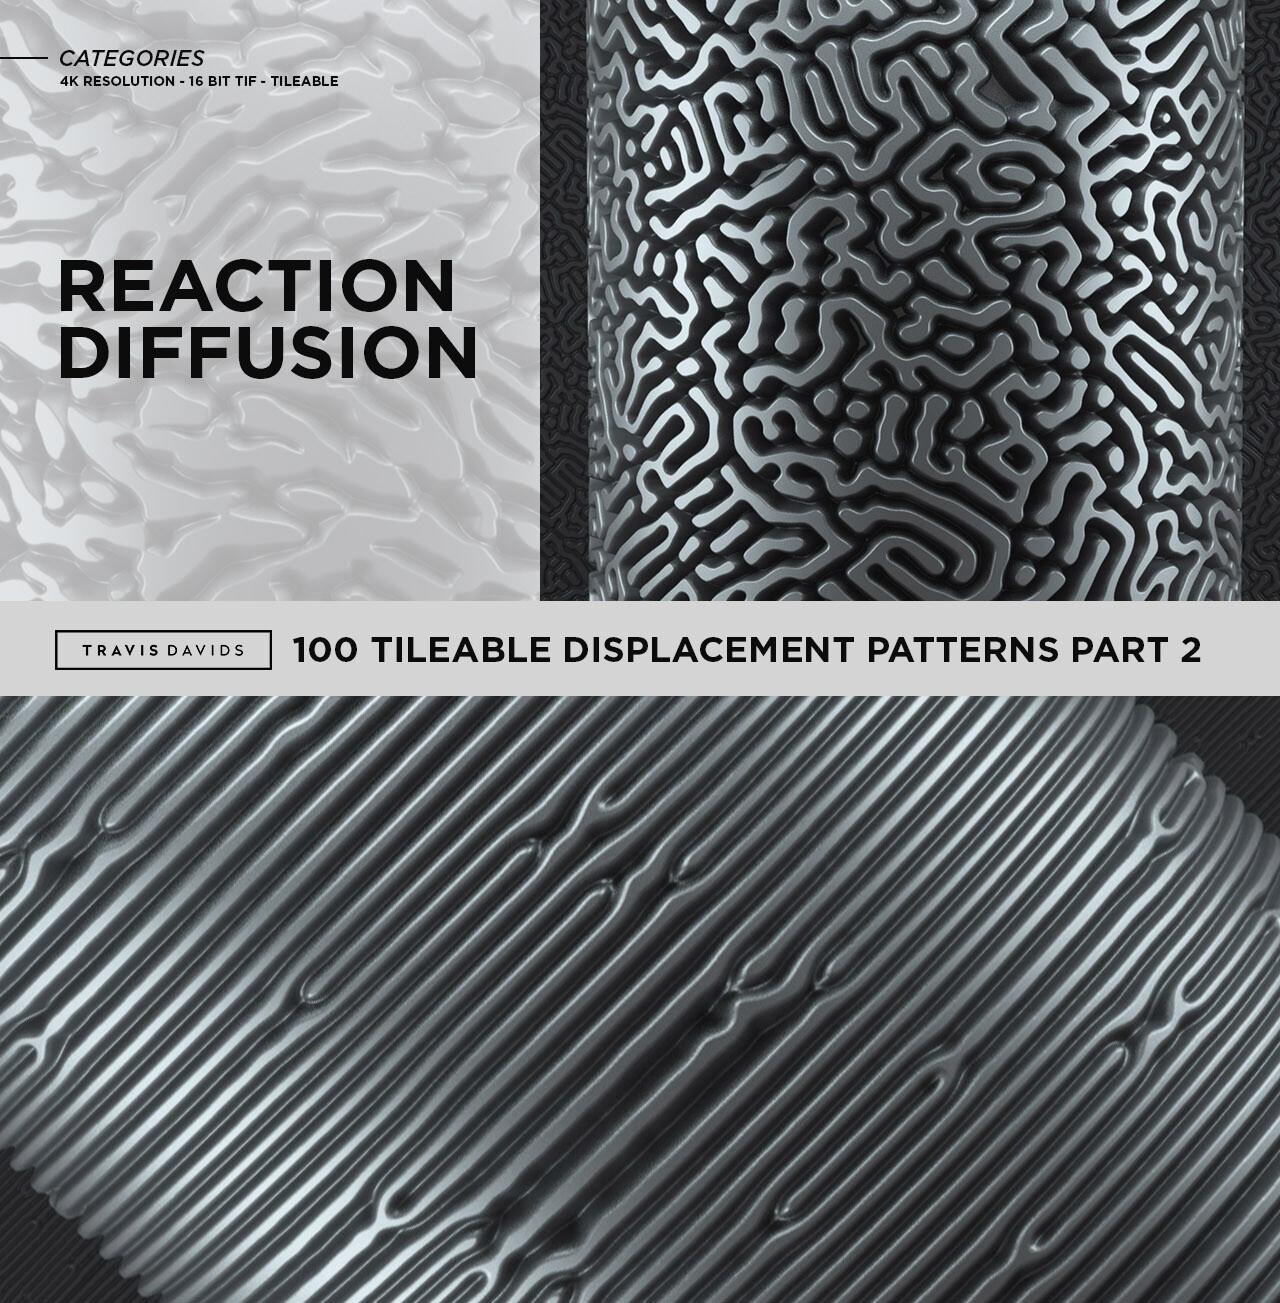 Travis davids categories reaction diffusion